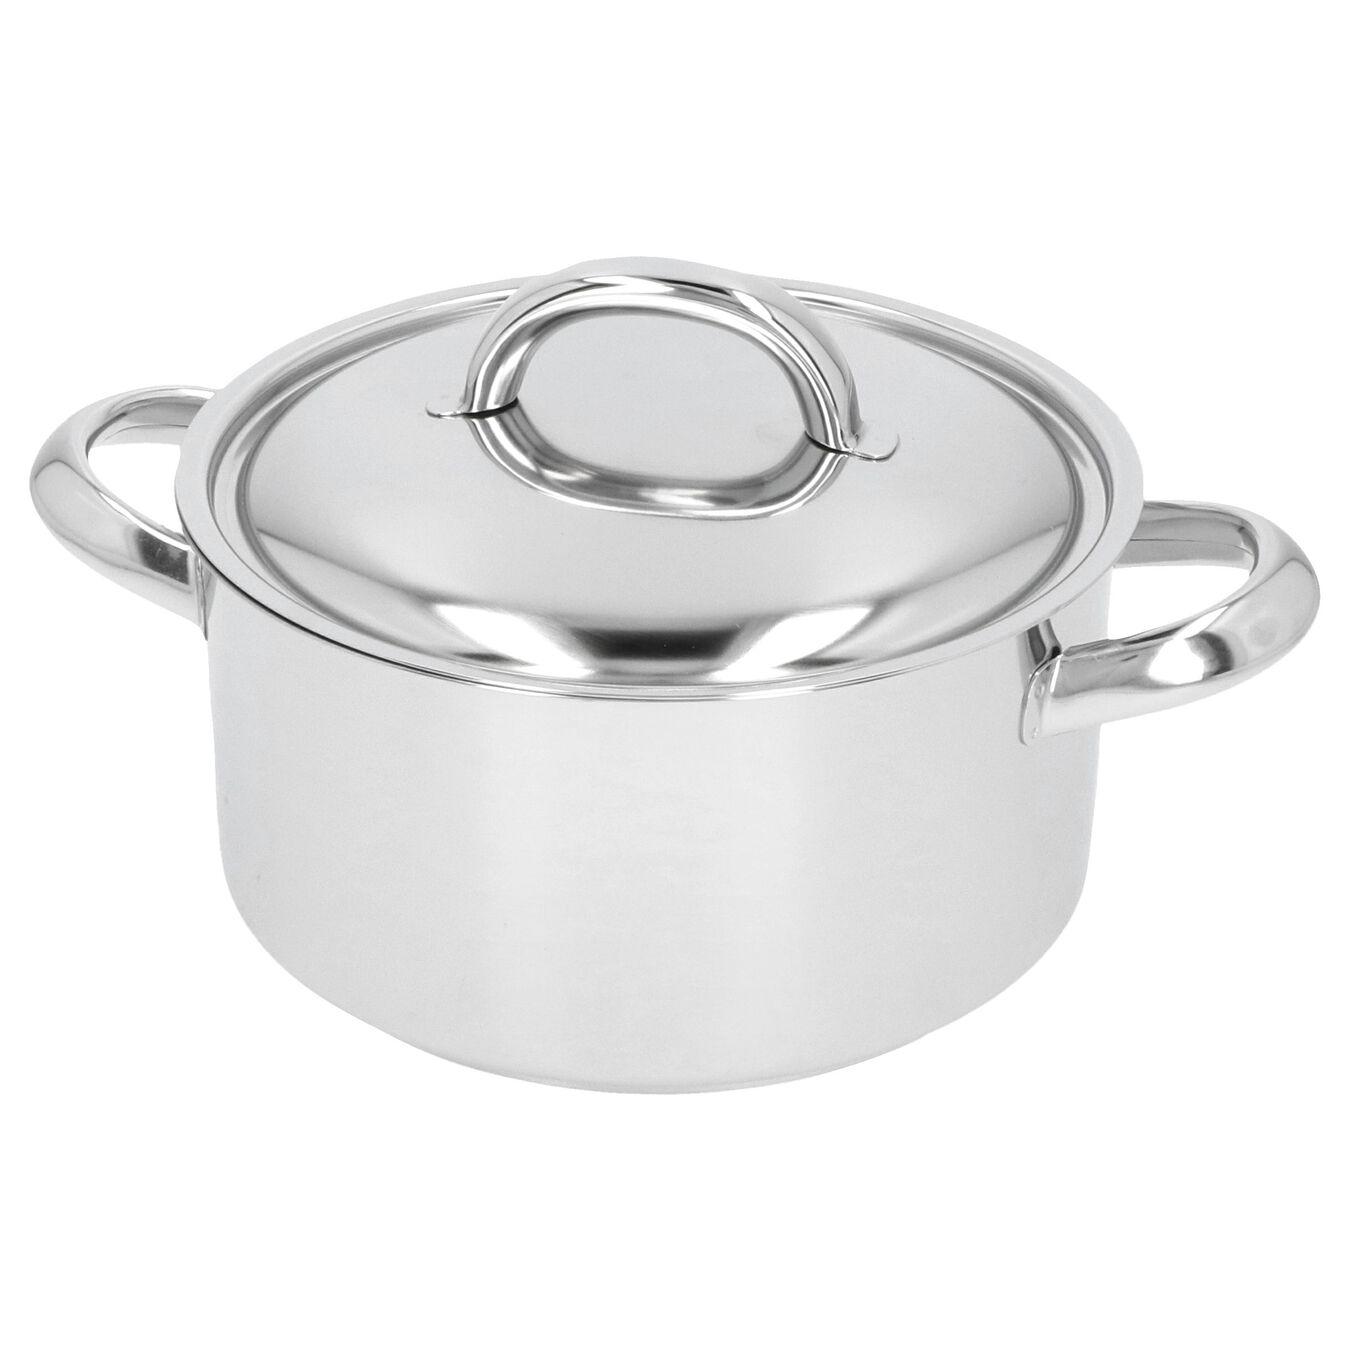 Kookpot met deksel 18 cm / 2,2 l,,large 6